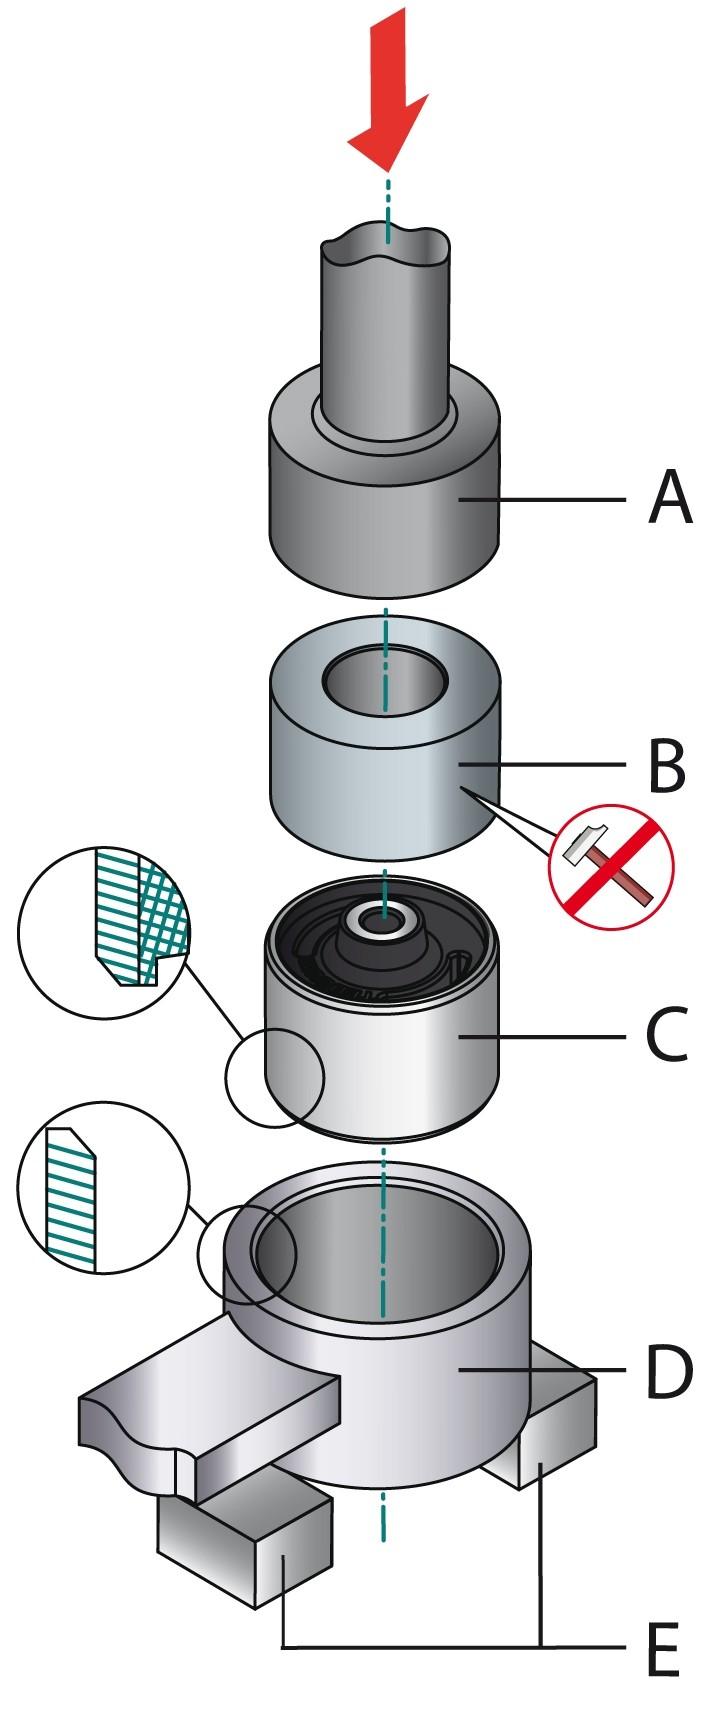 obraz montaż tulei metal-guma-metal 1